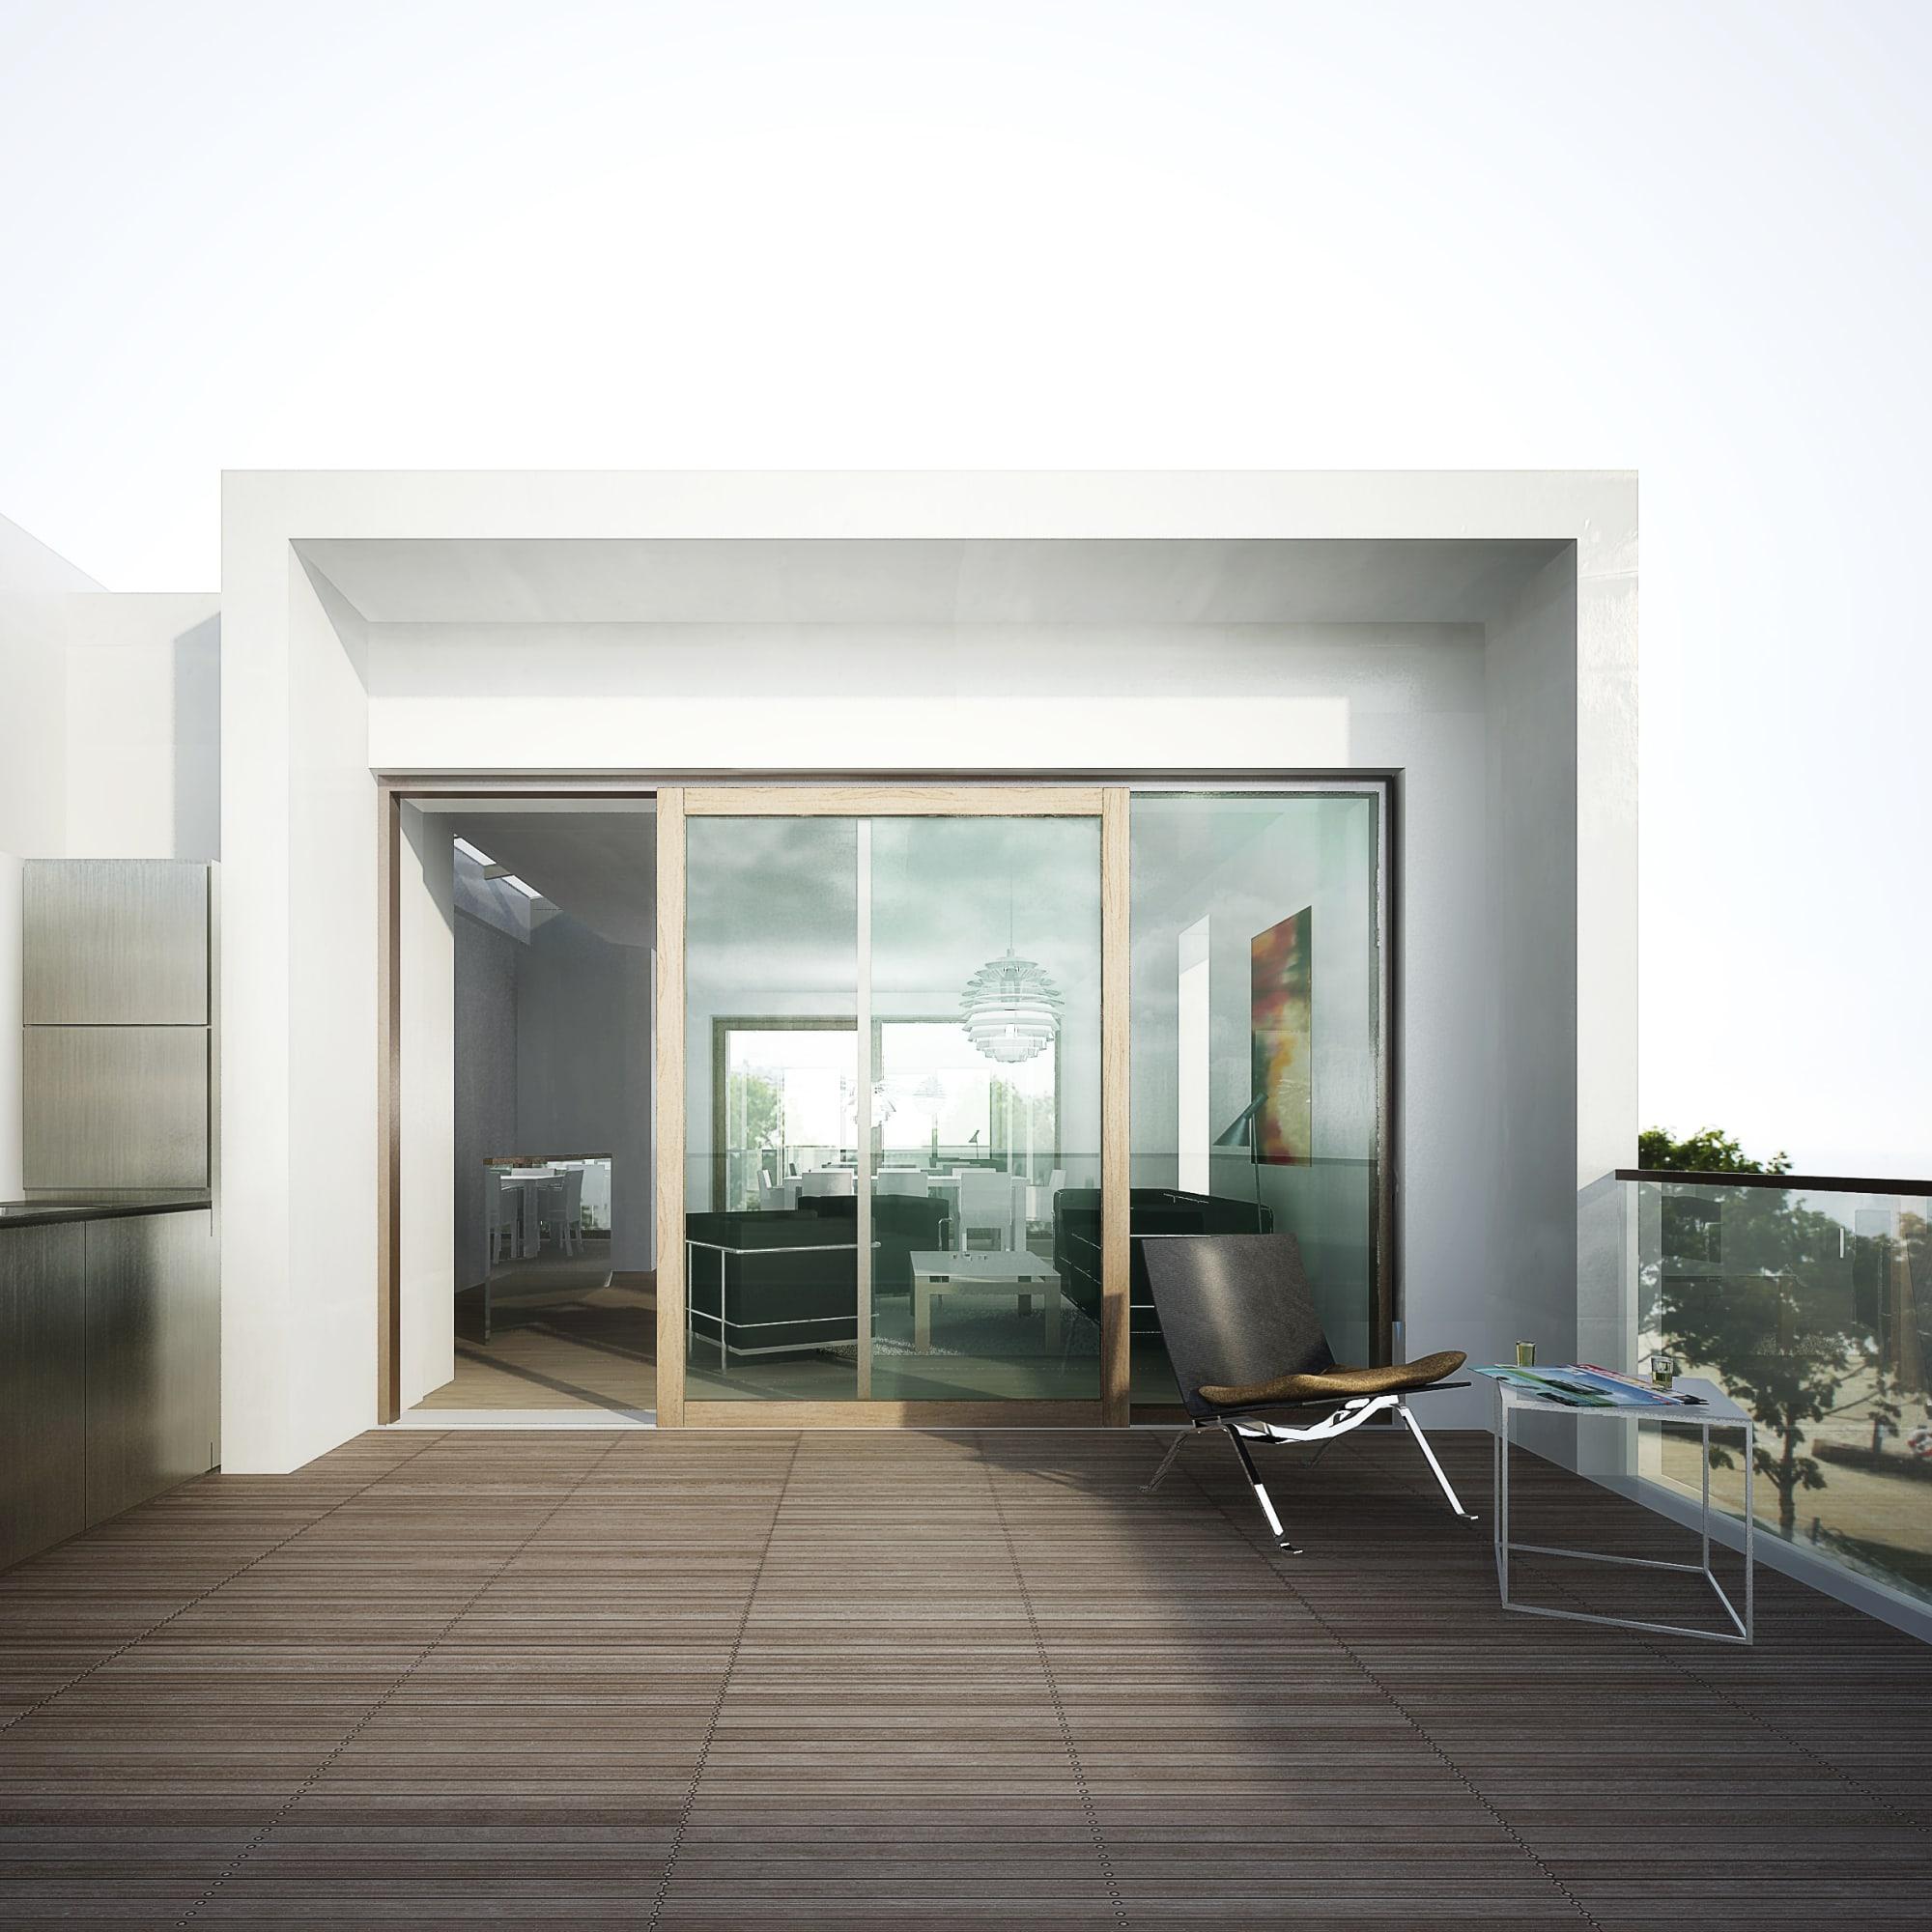 Patrician Apartments: Schmidt Hammer Lassen Architects · Strandpromenaden Urban